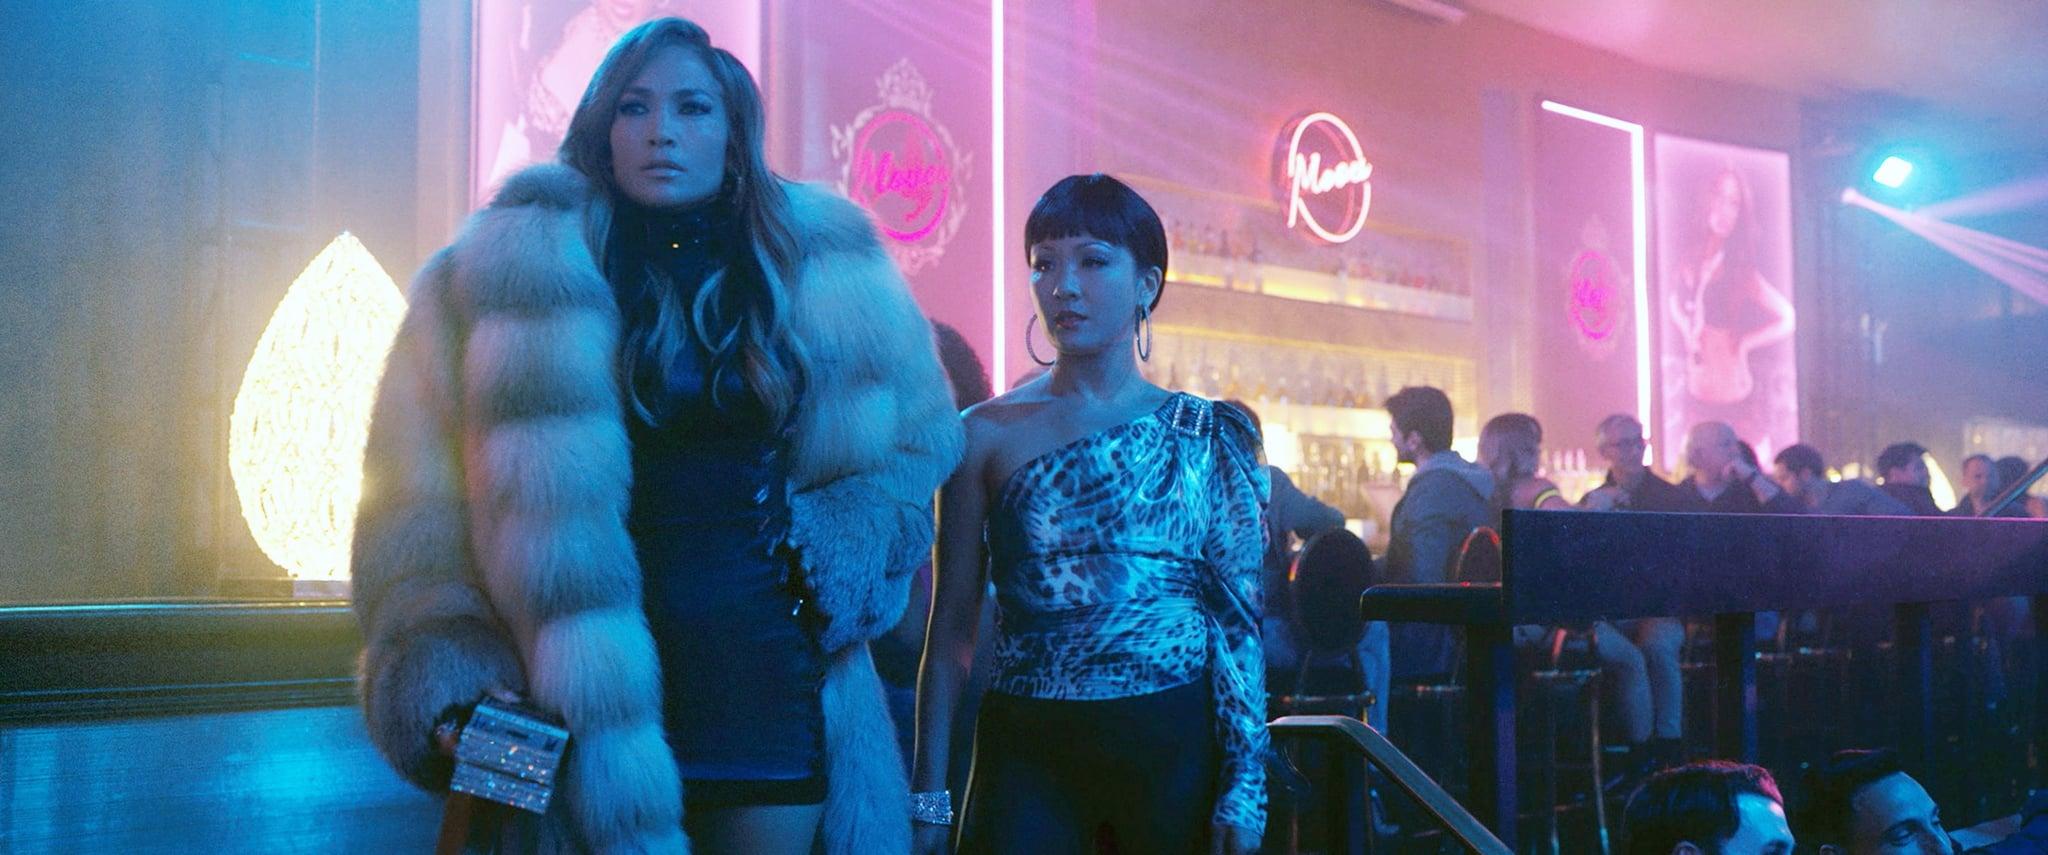 HUSTLERS, from left: Jennifer Lopez, Constance Wu, 2019.  STX Entertainment / courtesy Everett Collection